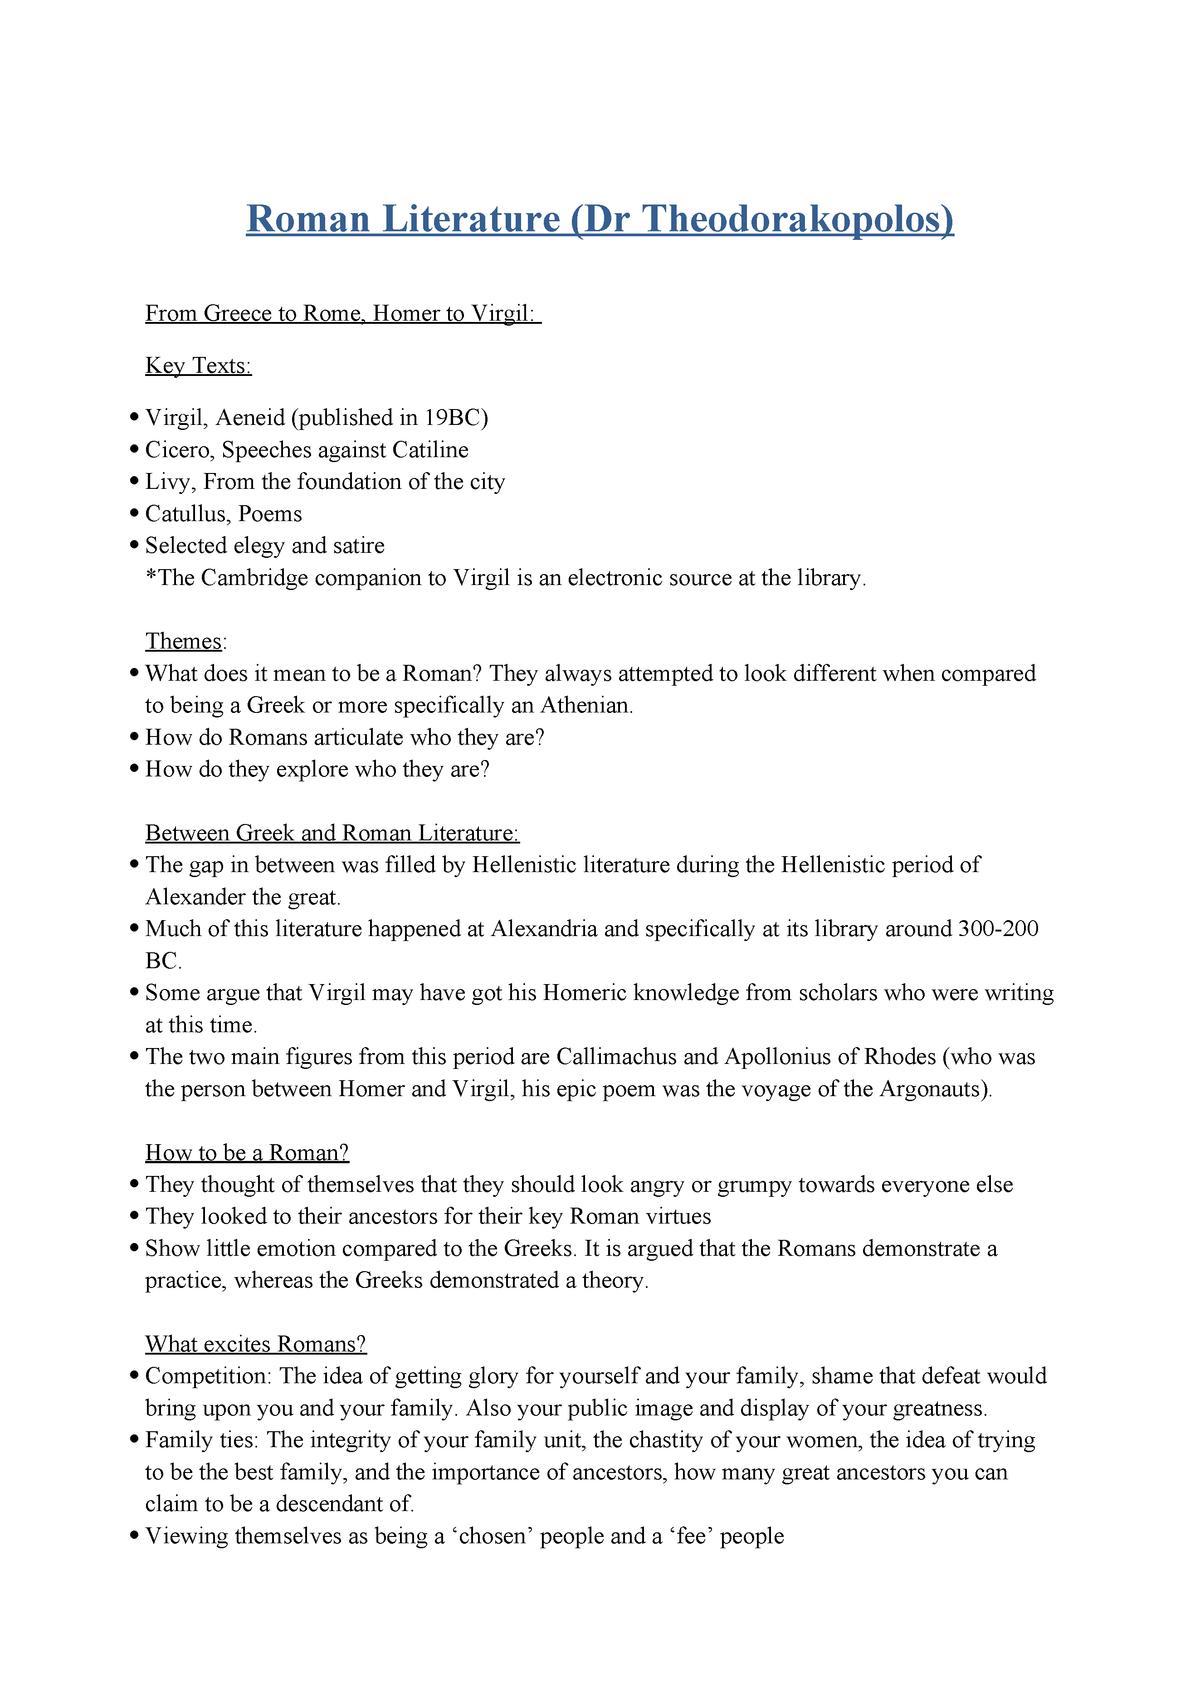 Lecture Notes Lectures Week 1 5 7 9 Roman Literature Studocu